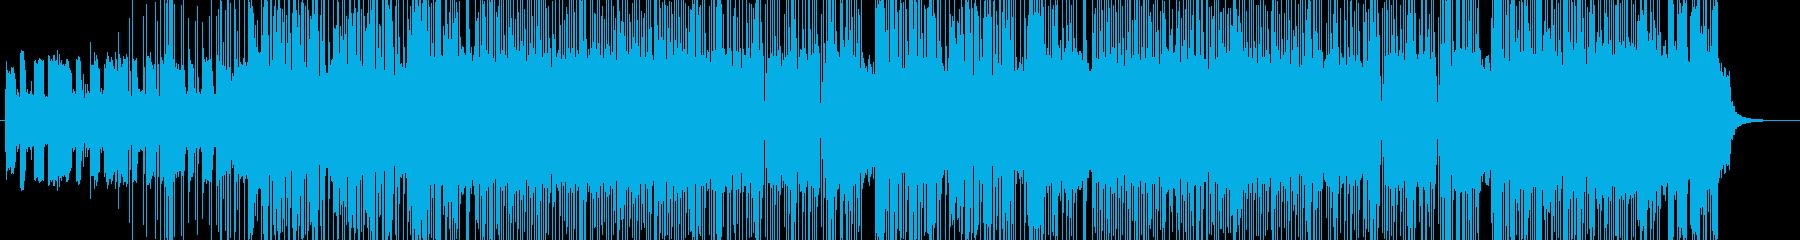 「HR/HM」「DARK」BGM253の再生済みの波形